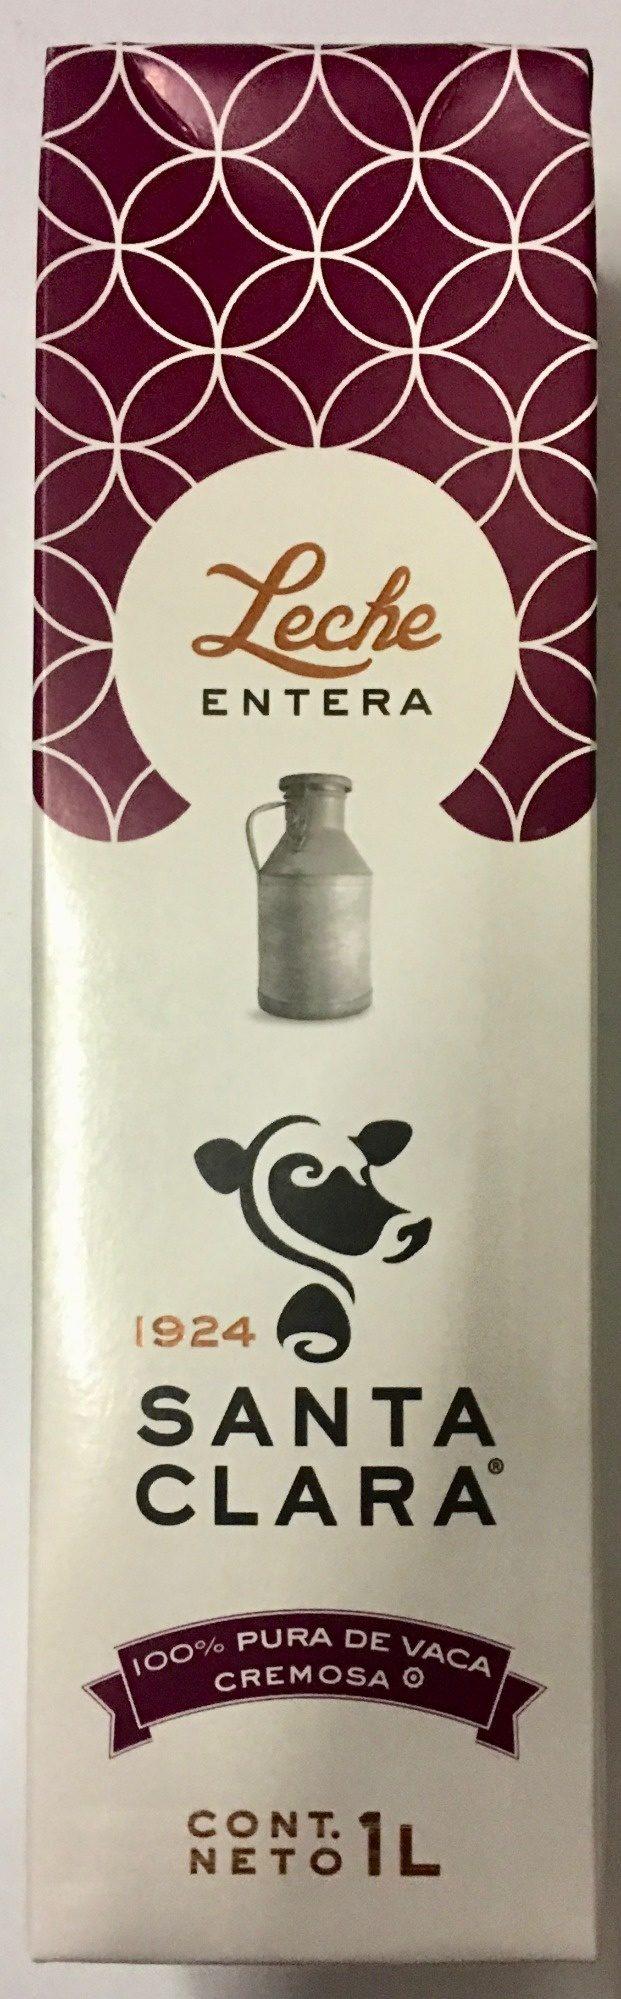 Santa Clara, Leche entera - Prodotto - es